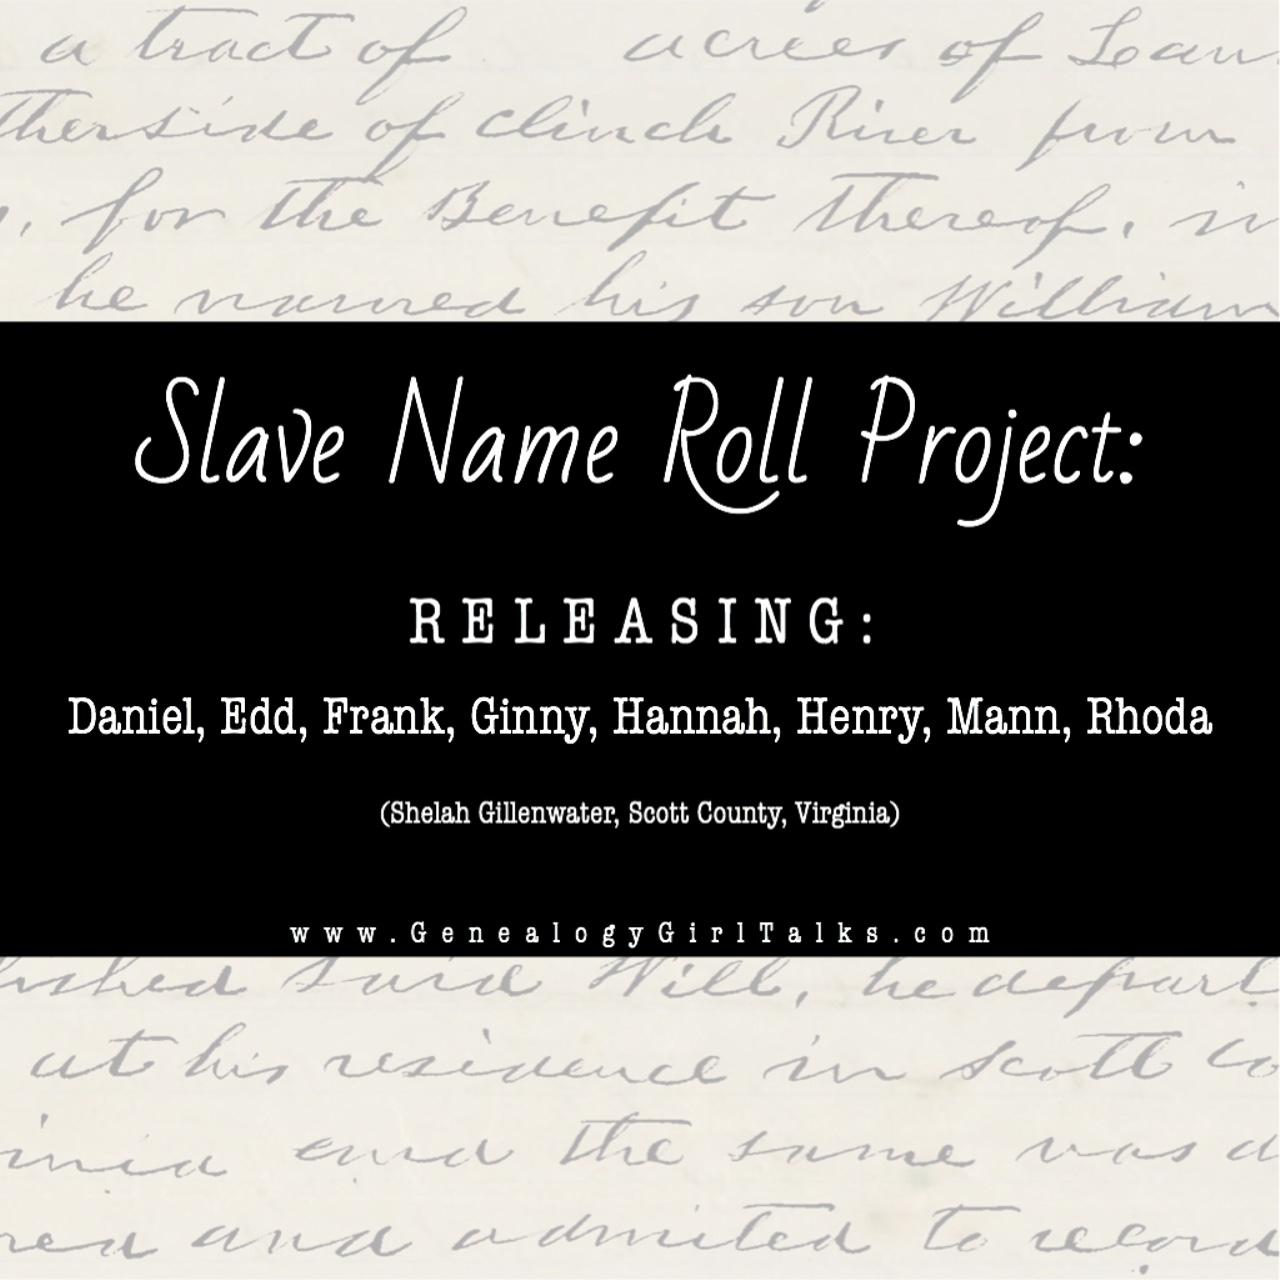 Slave Name Roll Project: Releasing Daniel, Edd, Frank, Ginny, Hannah, Henry, Mann, Rhoda | GenealogyGirlTalks.com